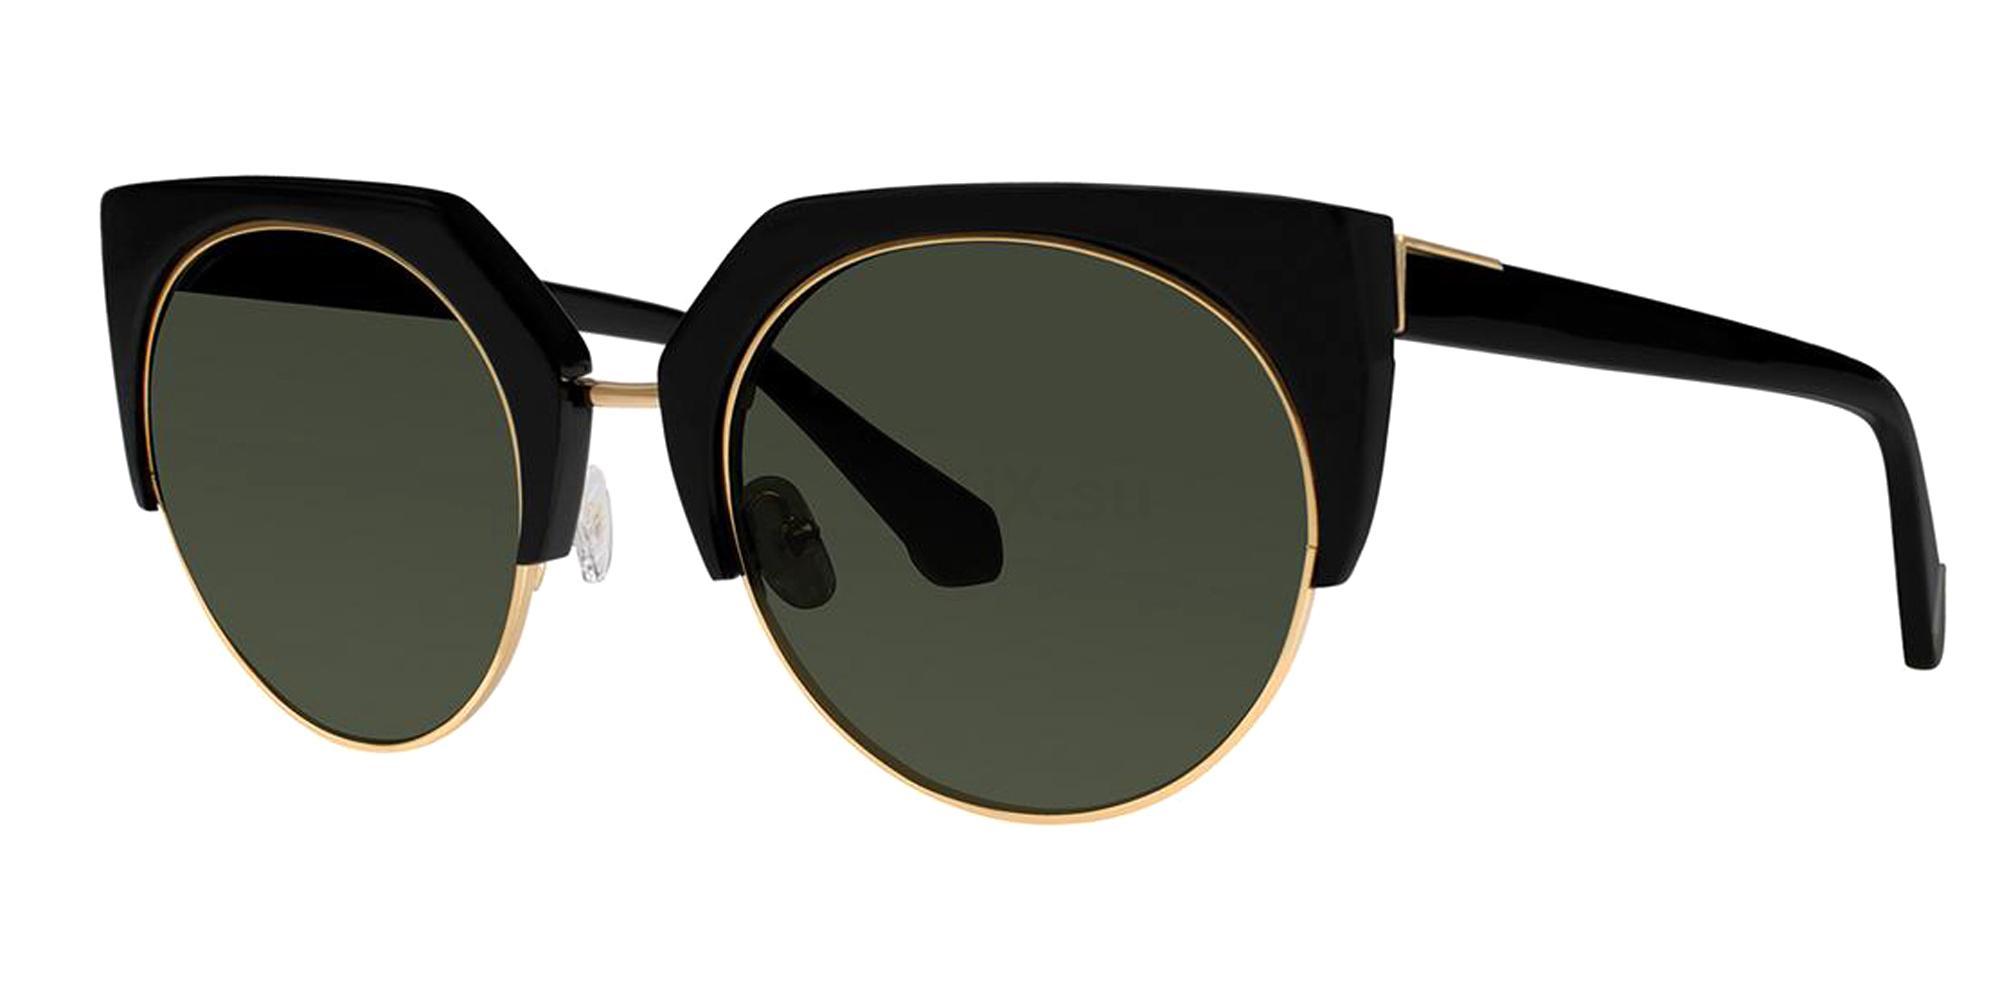 Black NAOMI Sunglasses, Zac Posen